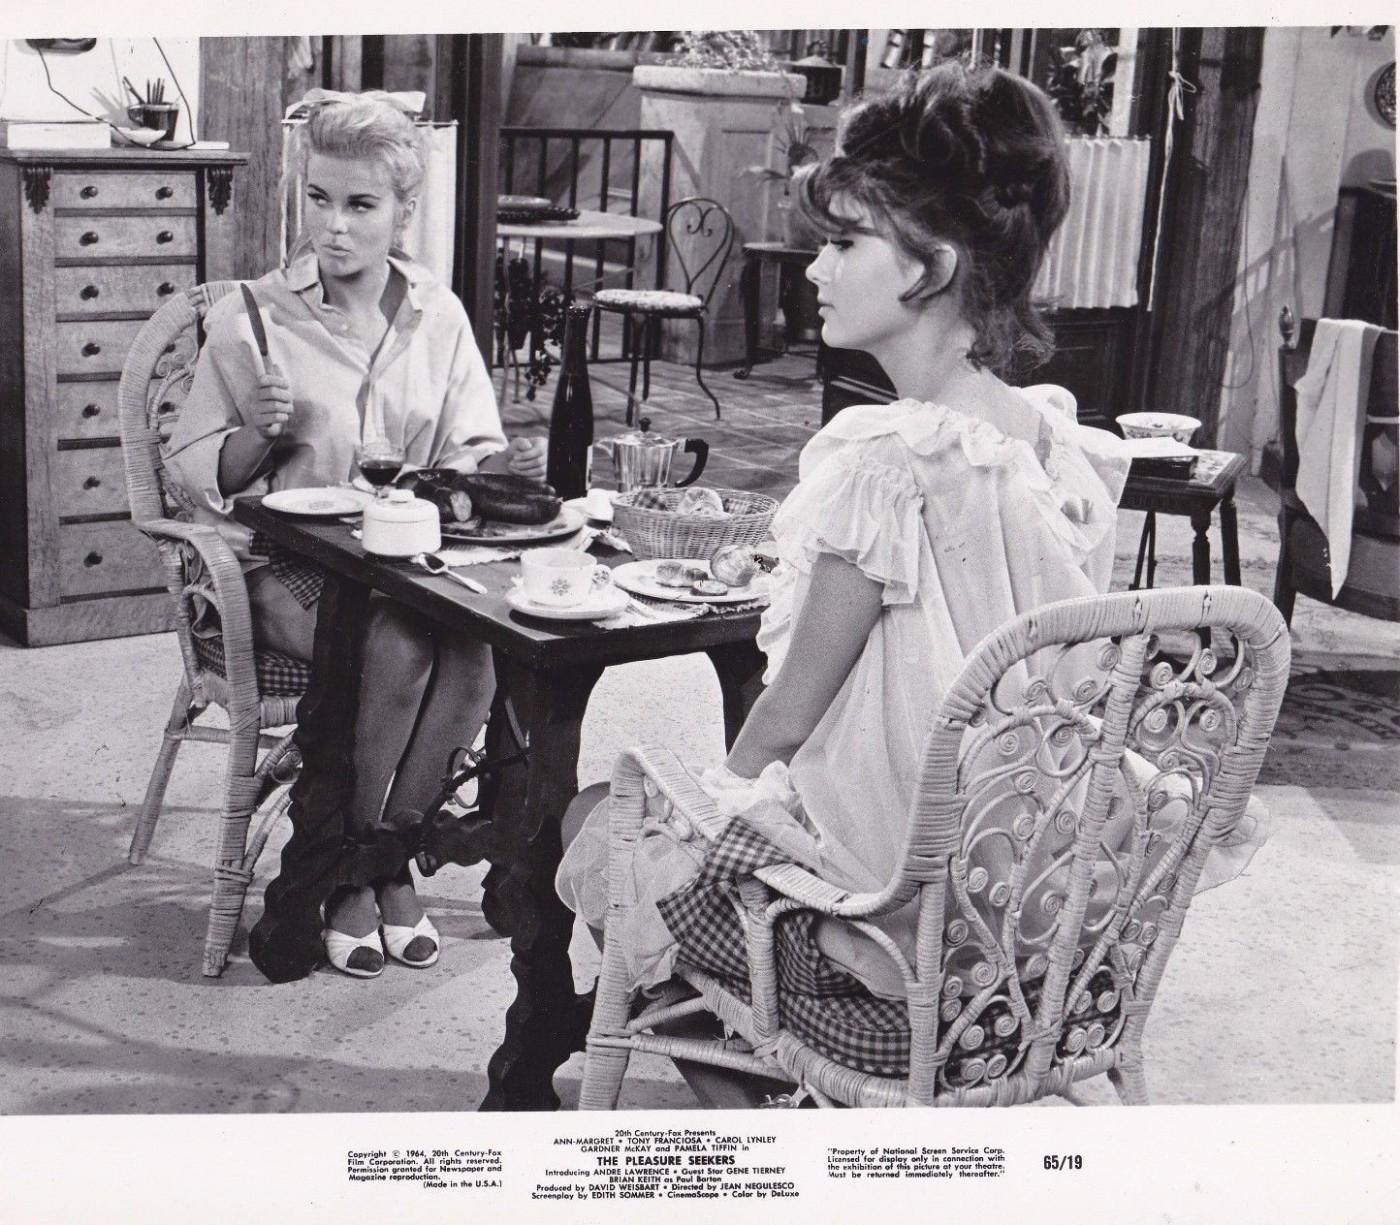 Mujeres-blanco y negro- - Página 14 Ann-margret-pamela-tiffin-8x10-movie-still-photo-1964-pleasure-seekers-e1445054218969